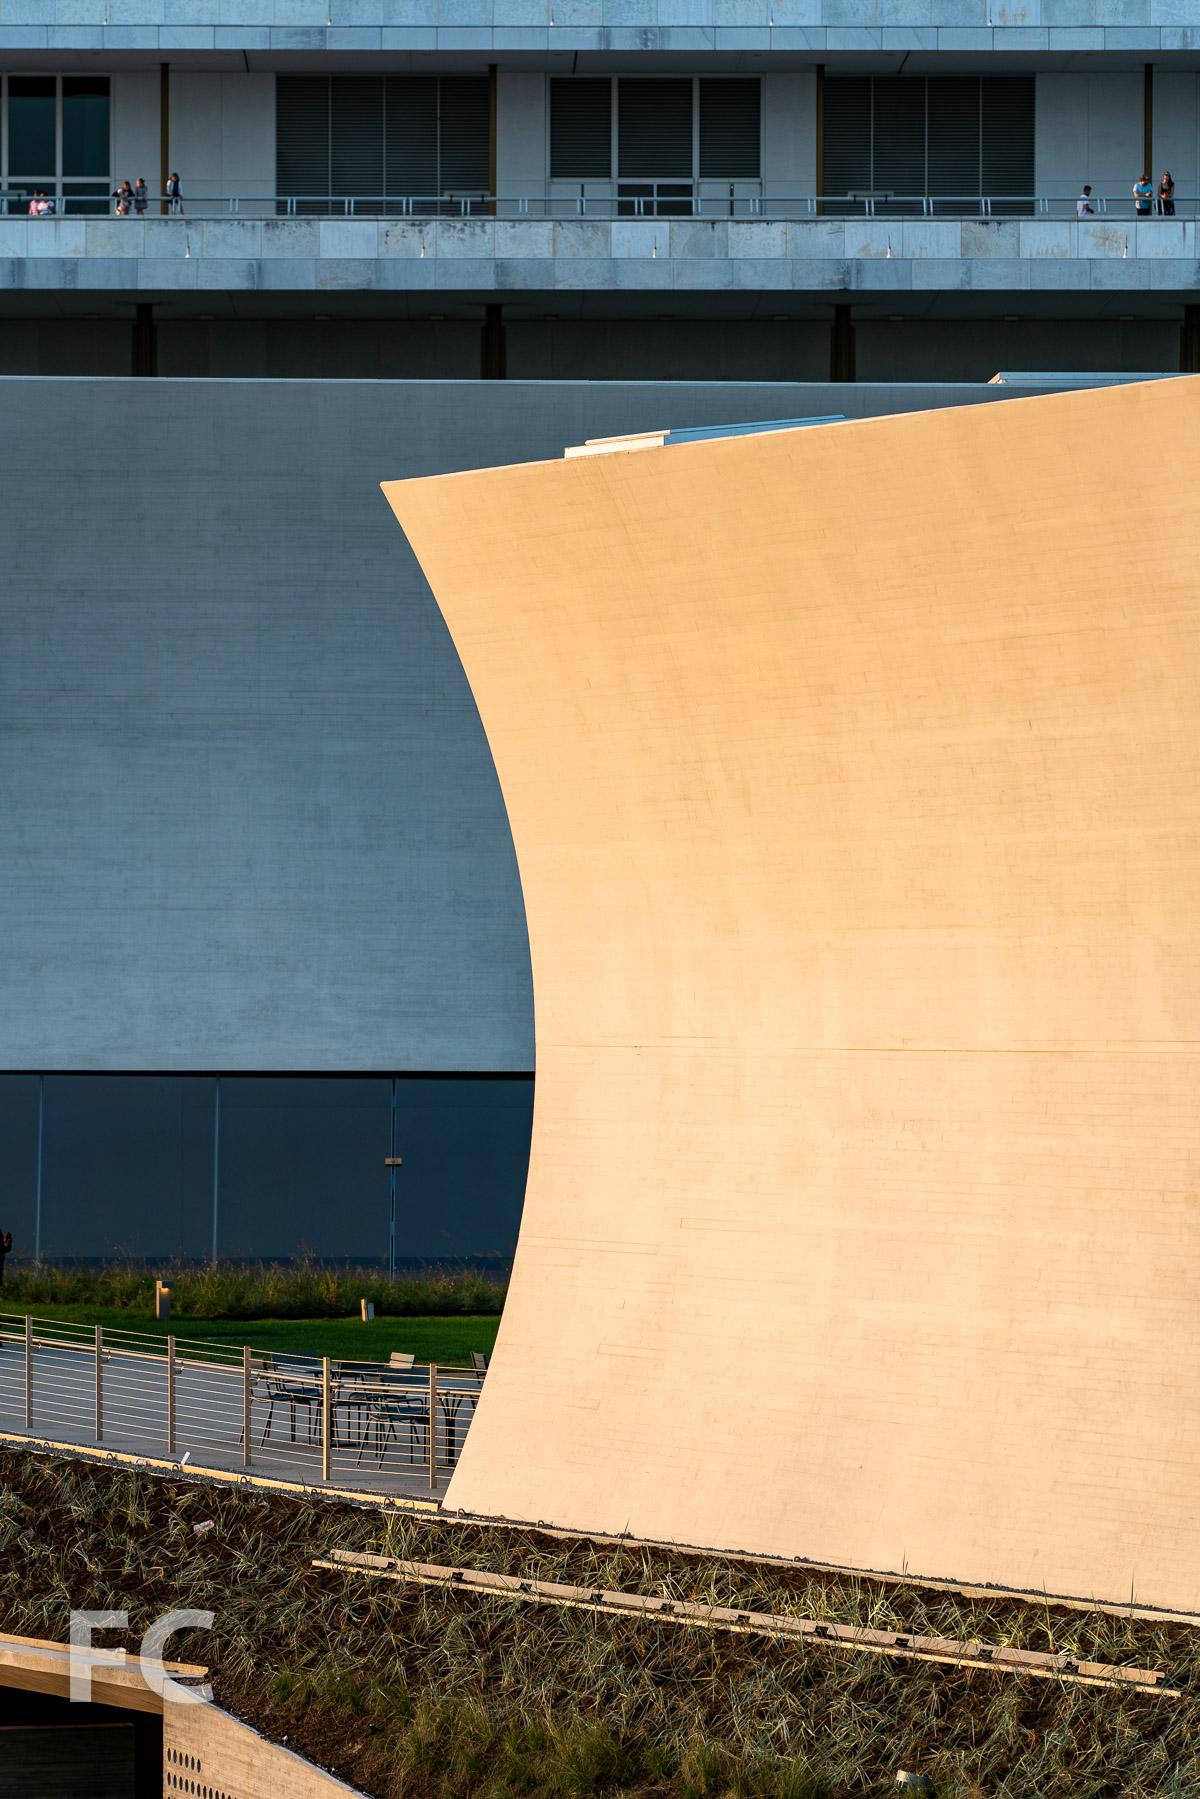 20190831-The Reach at Kennedy Center-DSC06246.jpg